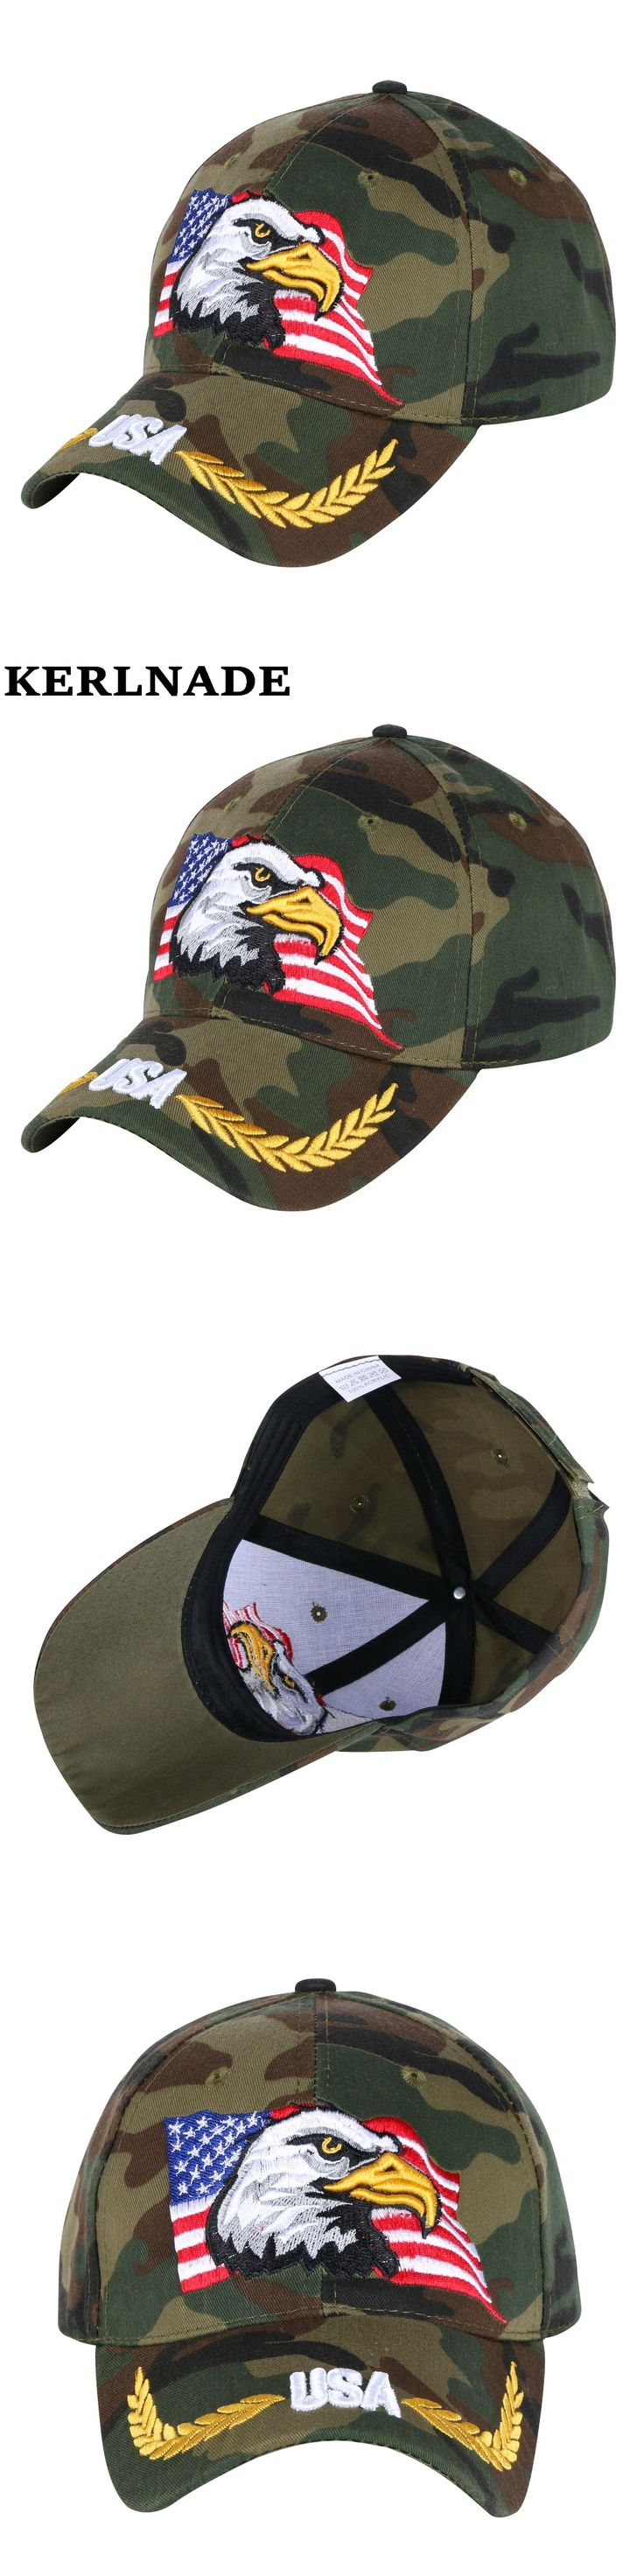 men boy brand baseball cap customized design eagle character embroidery camouflage style novelty snapback hats women girl hat